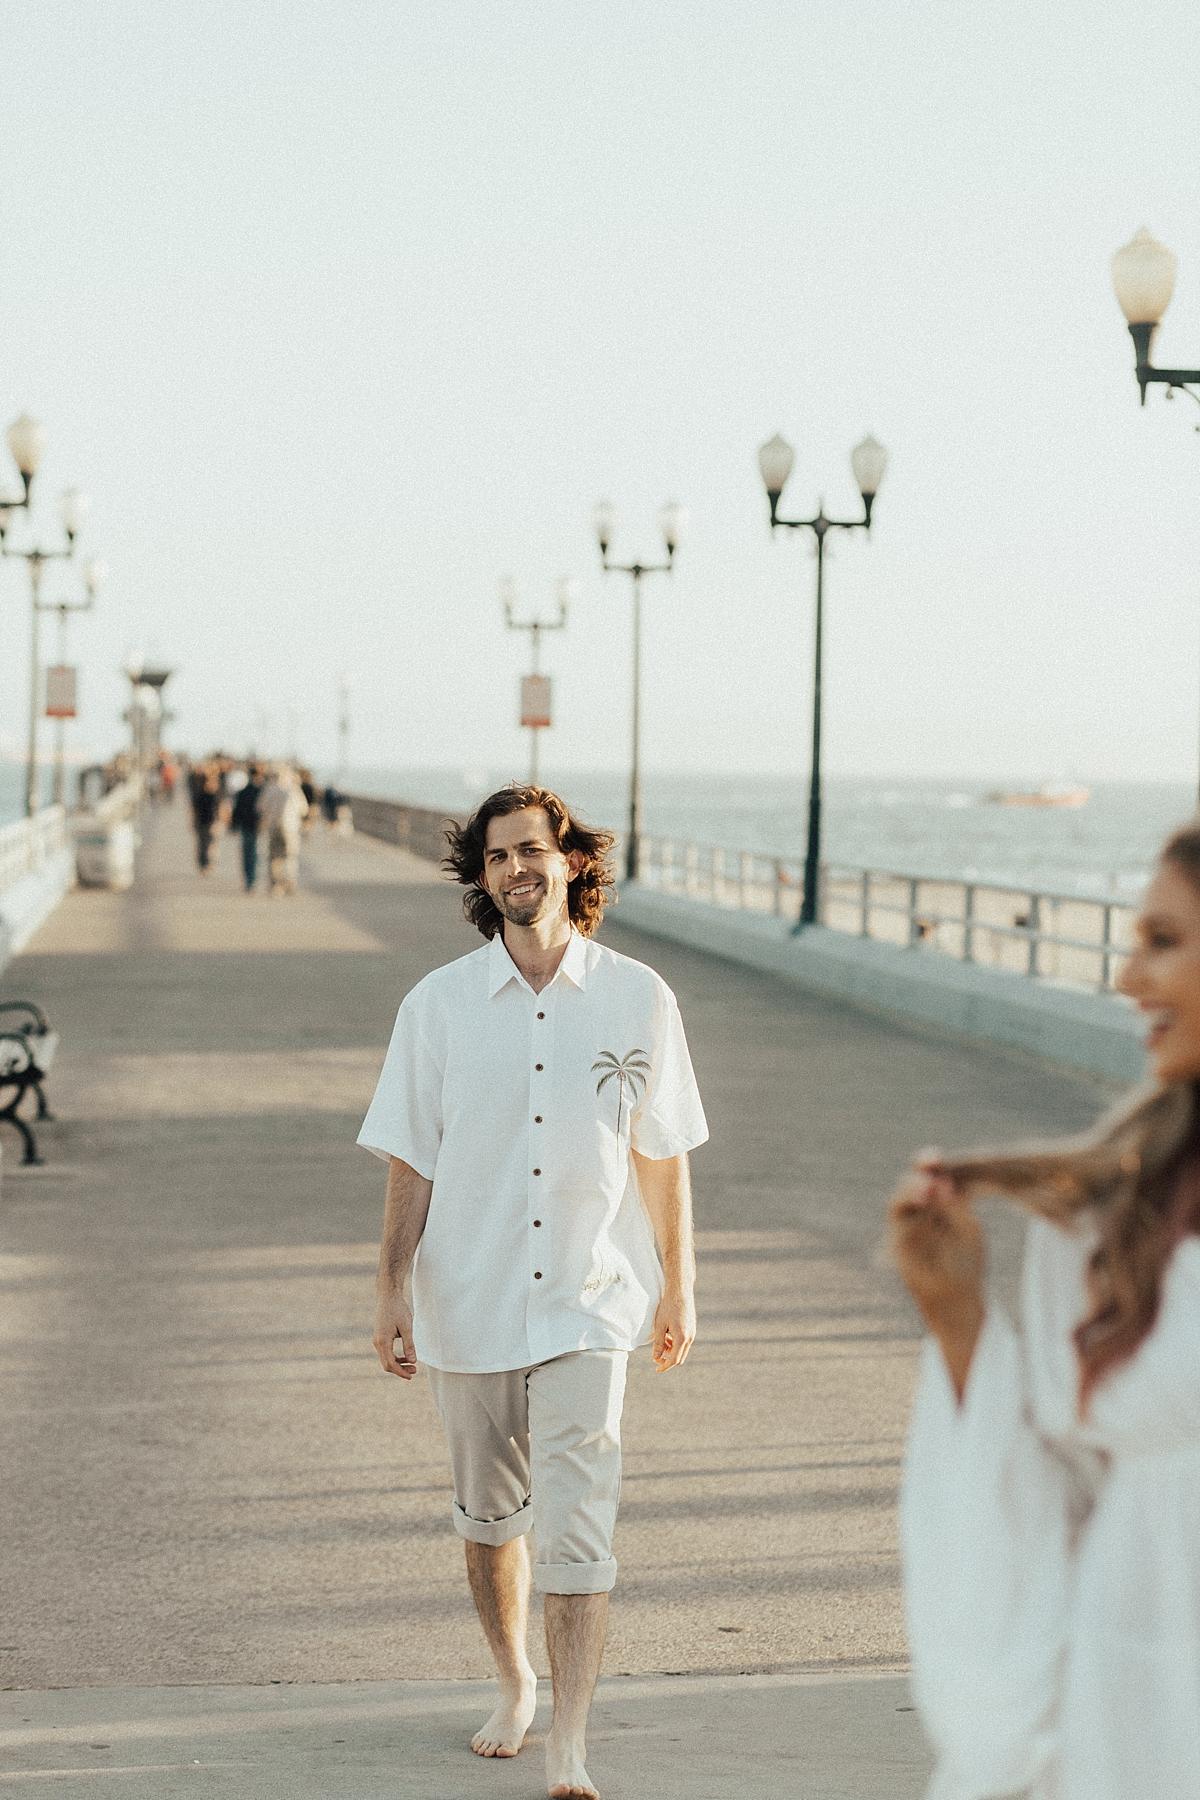 California Beach Engagement Photography Los Angeles Photographer Rachel Wakefield Kelsey Hickox and Austen Mayer-2.jpg